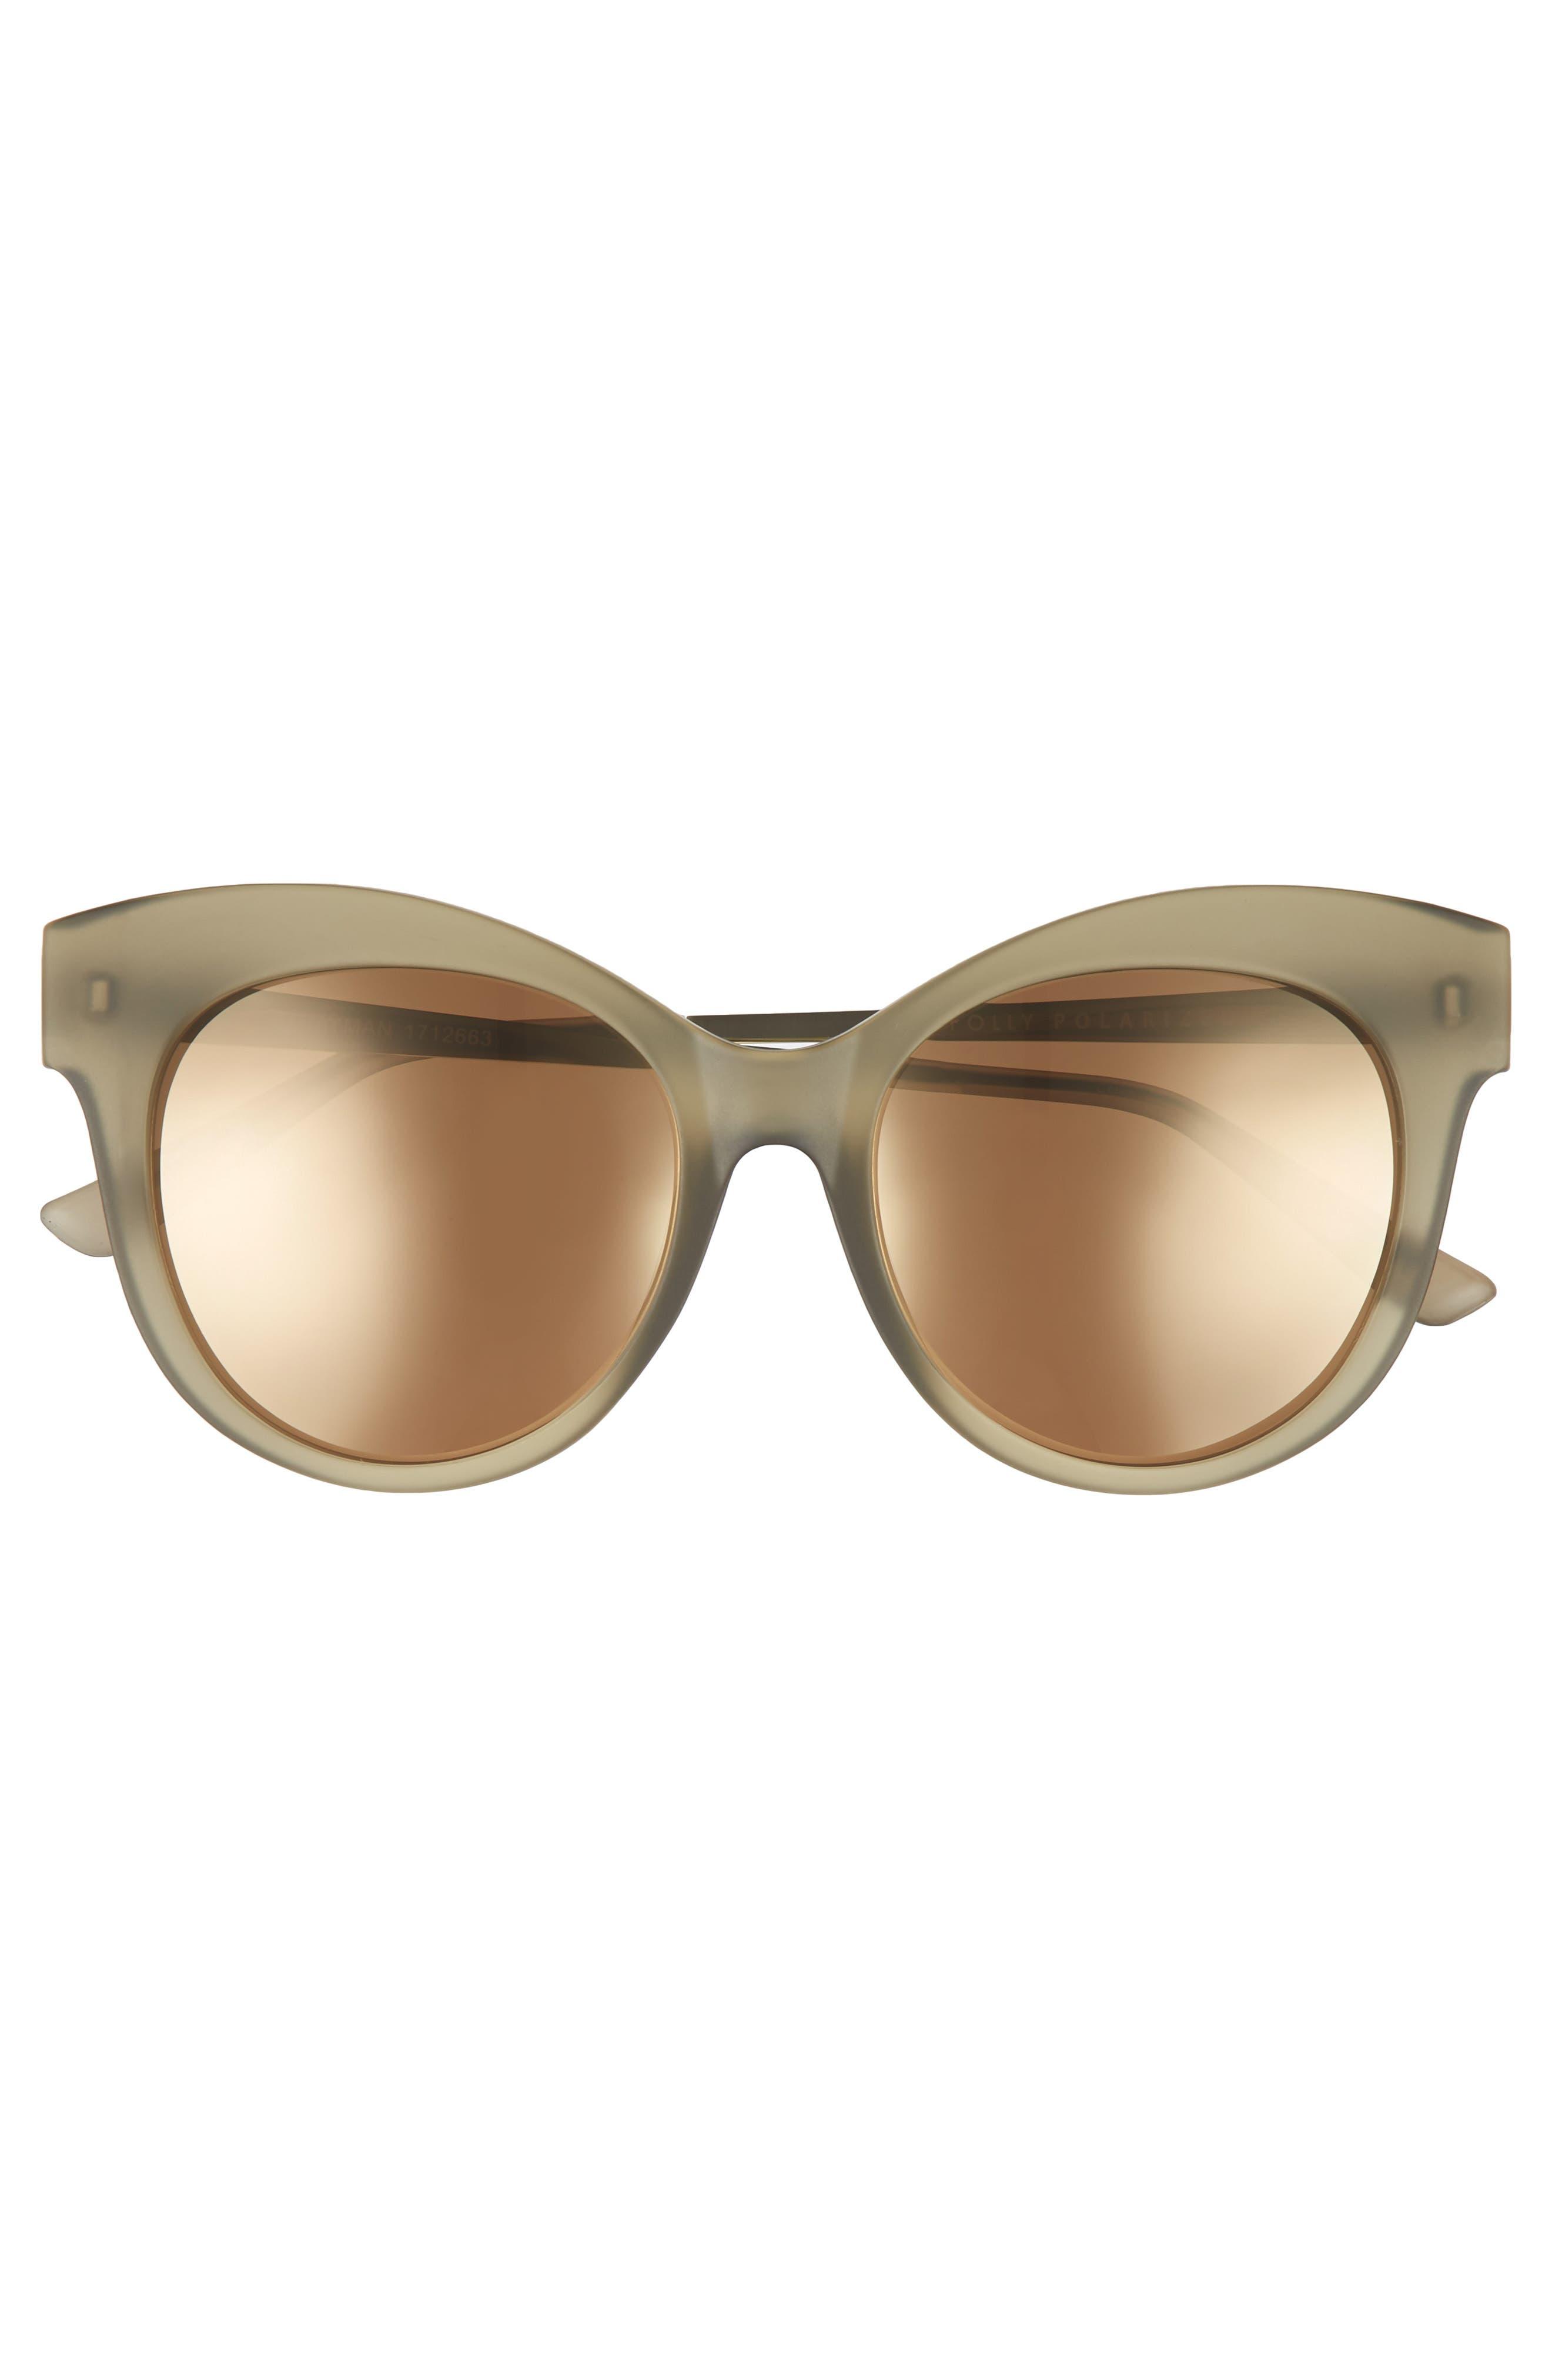 Hayman 53mm Cat Eye Sunglasses,                             Alternate thumbnail 3, color,                             Moss